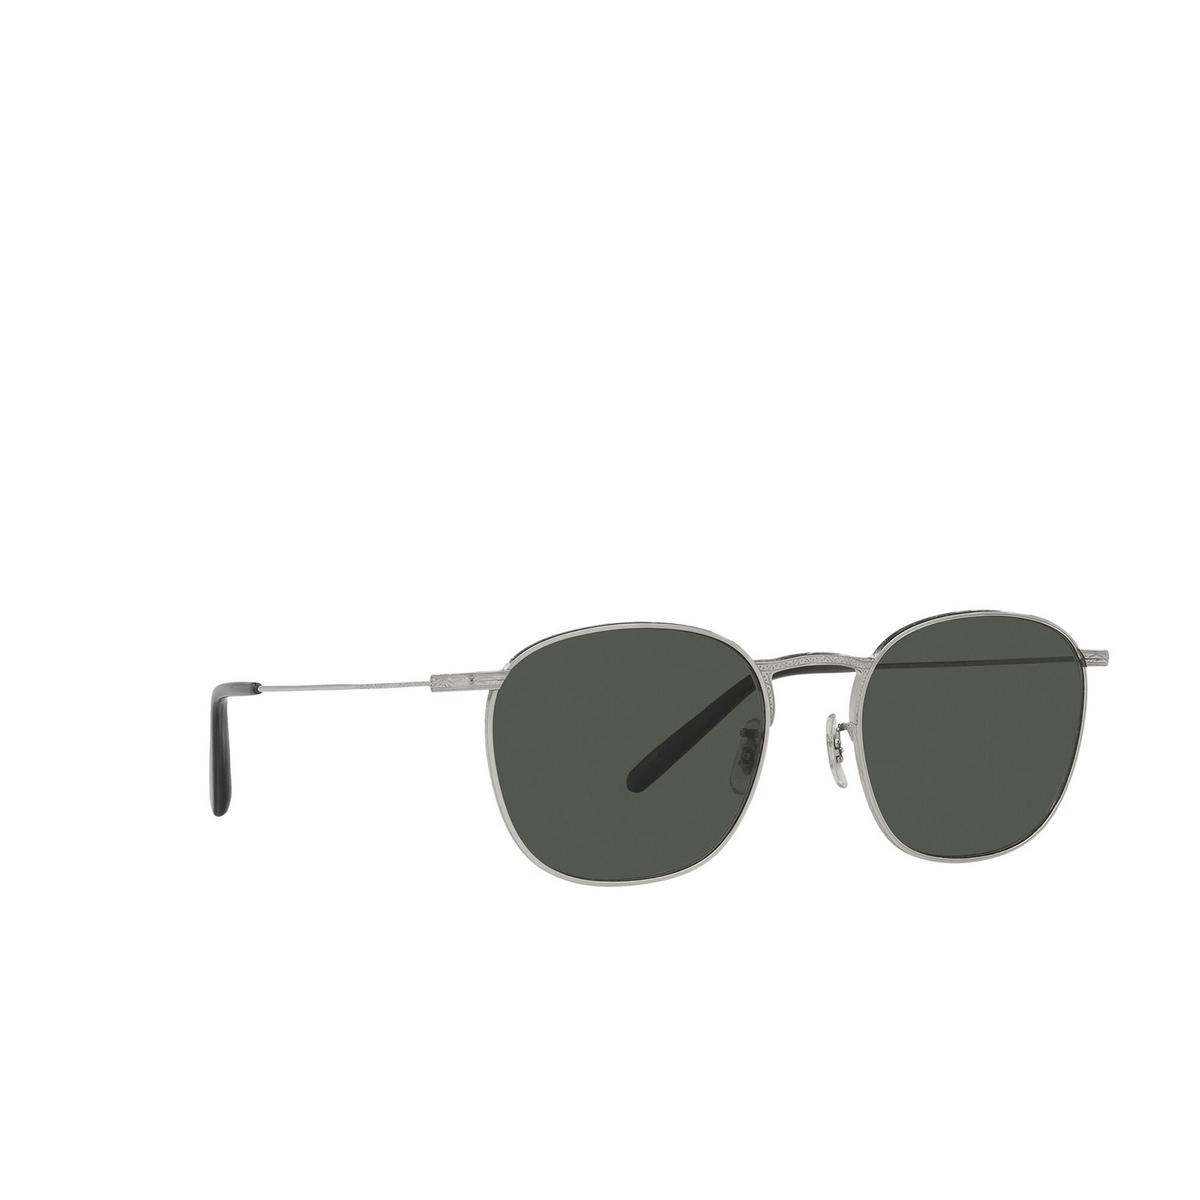 Oliver Peoples® Square Sunglasses: Goldsen Sun OV1285ST color Silver 5036P2 - three-quarters view.